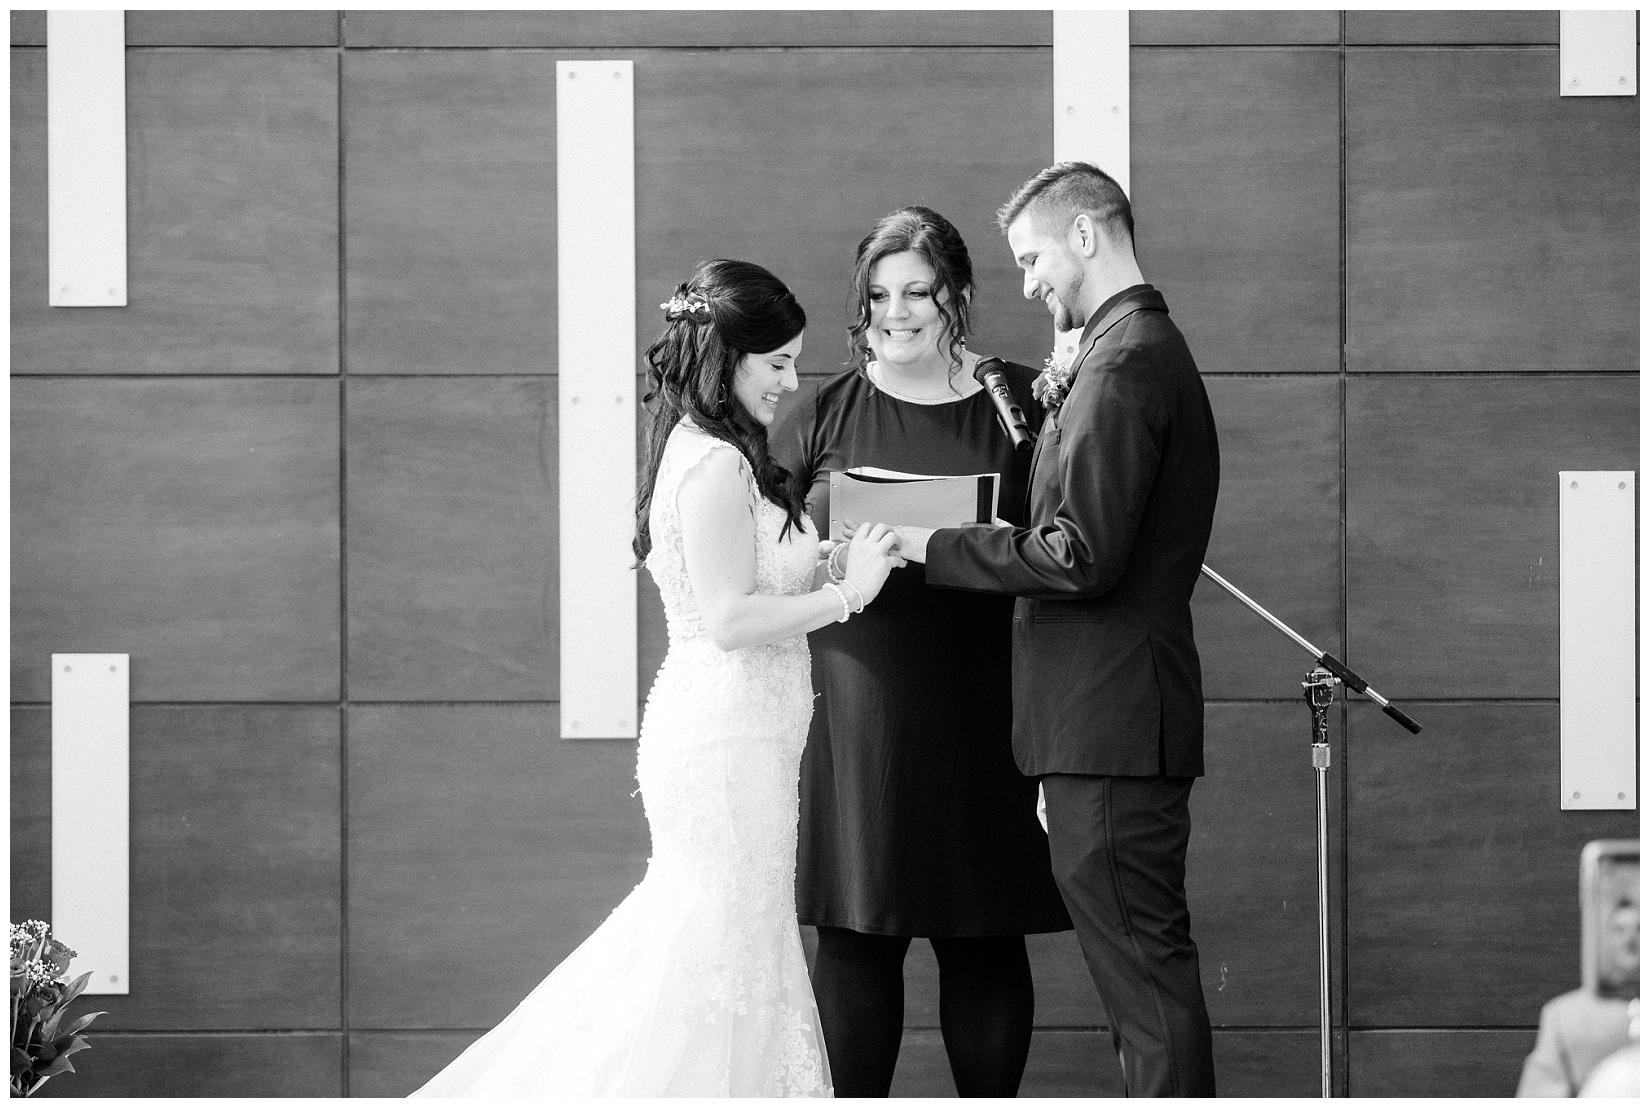 cat-alkire-wedding-photographer-indiana-chicago-indianapolis-fort-wayne_1088.jpg